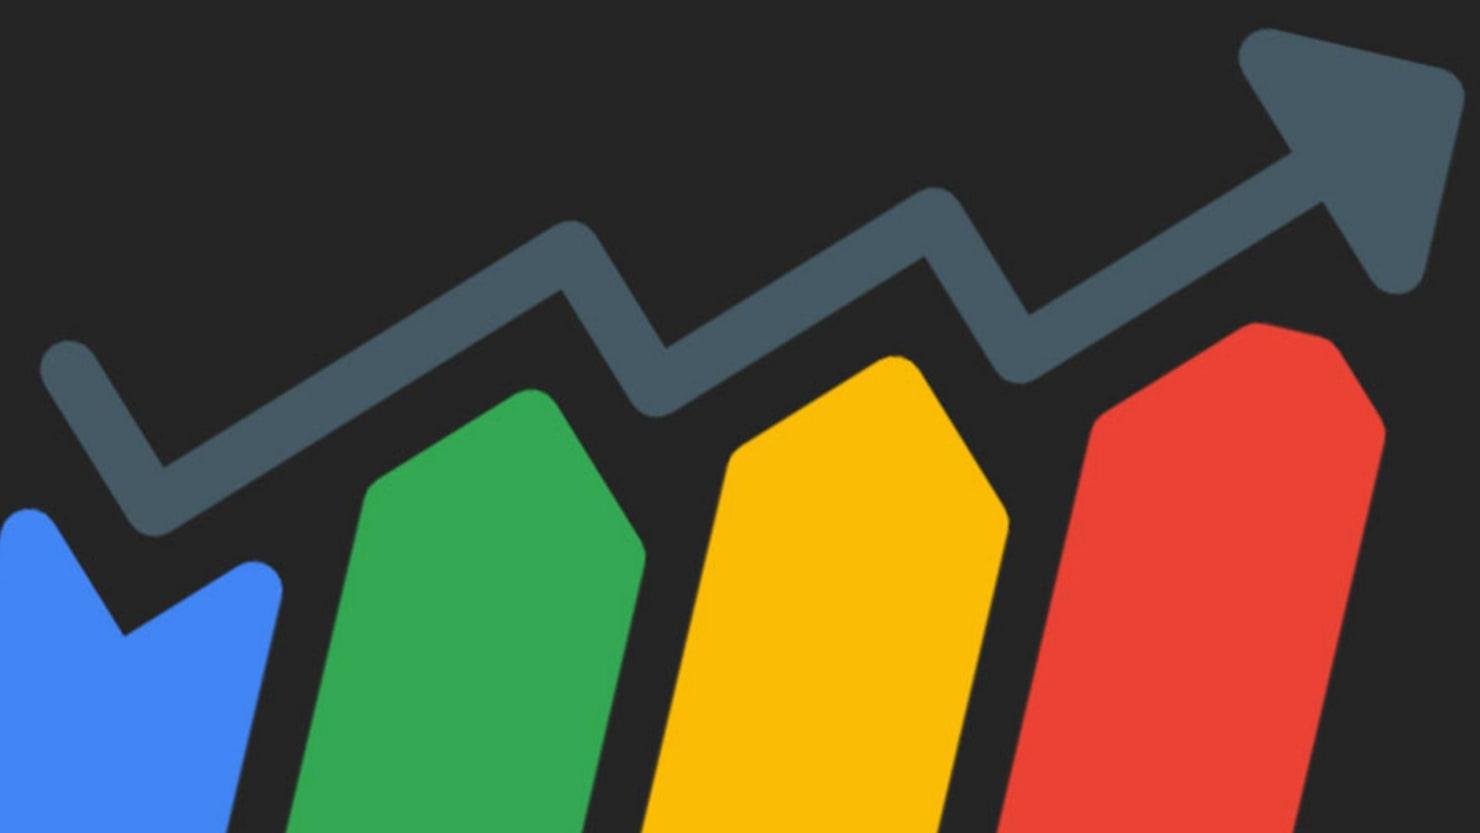 Pass the Google Analytics Certification Exam With This Rigorous Prep Course